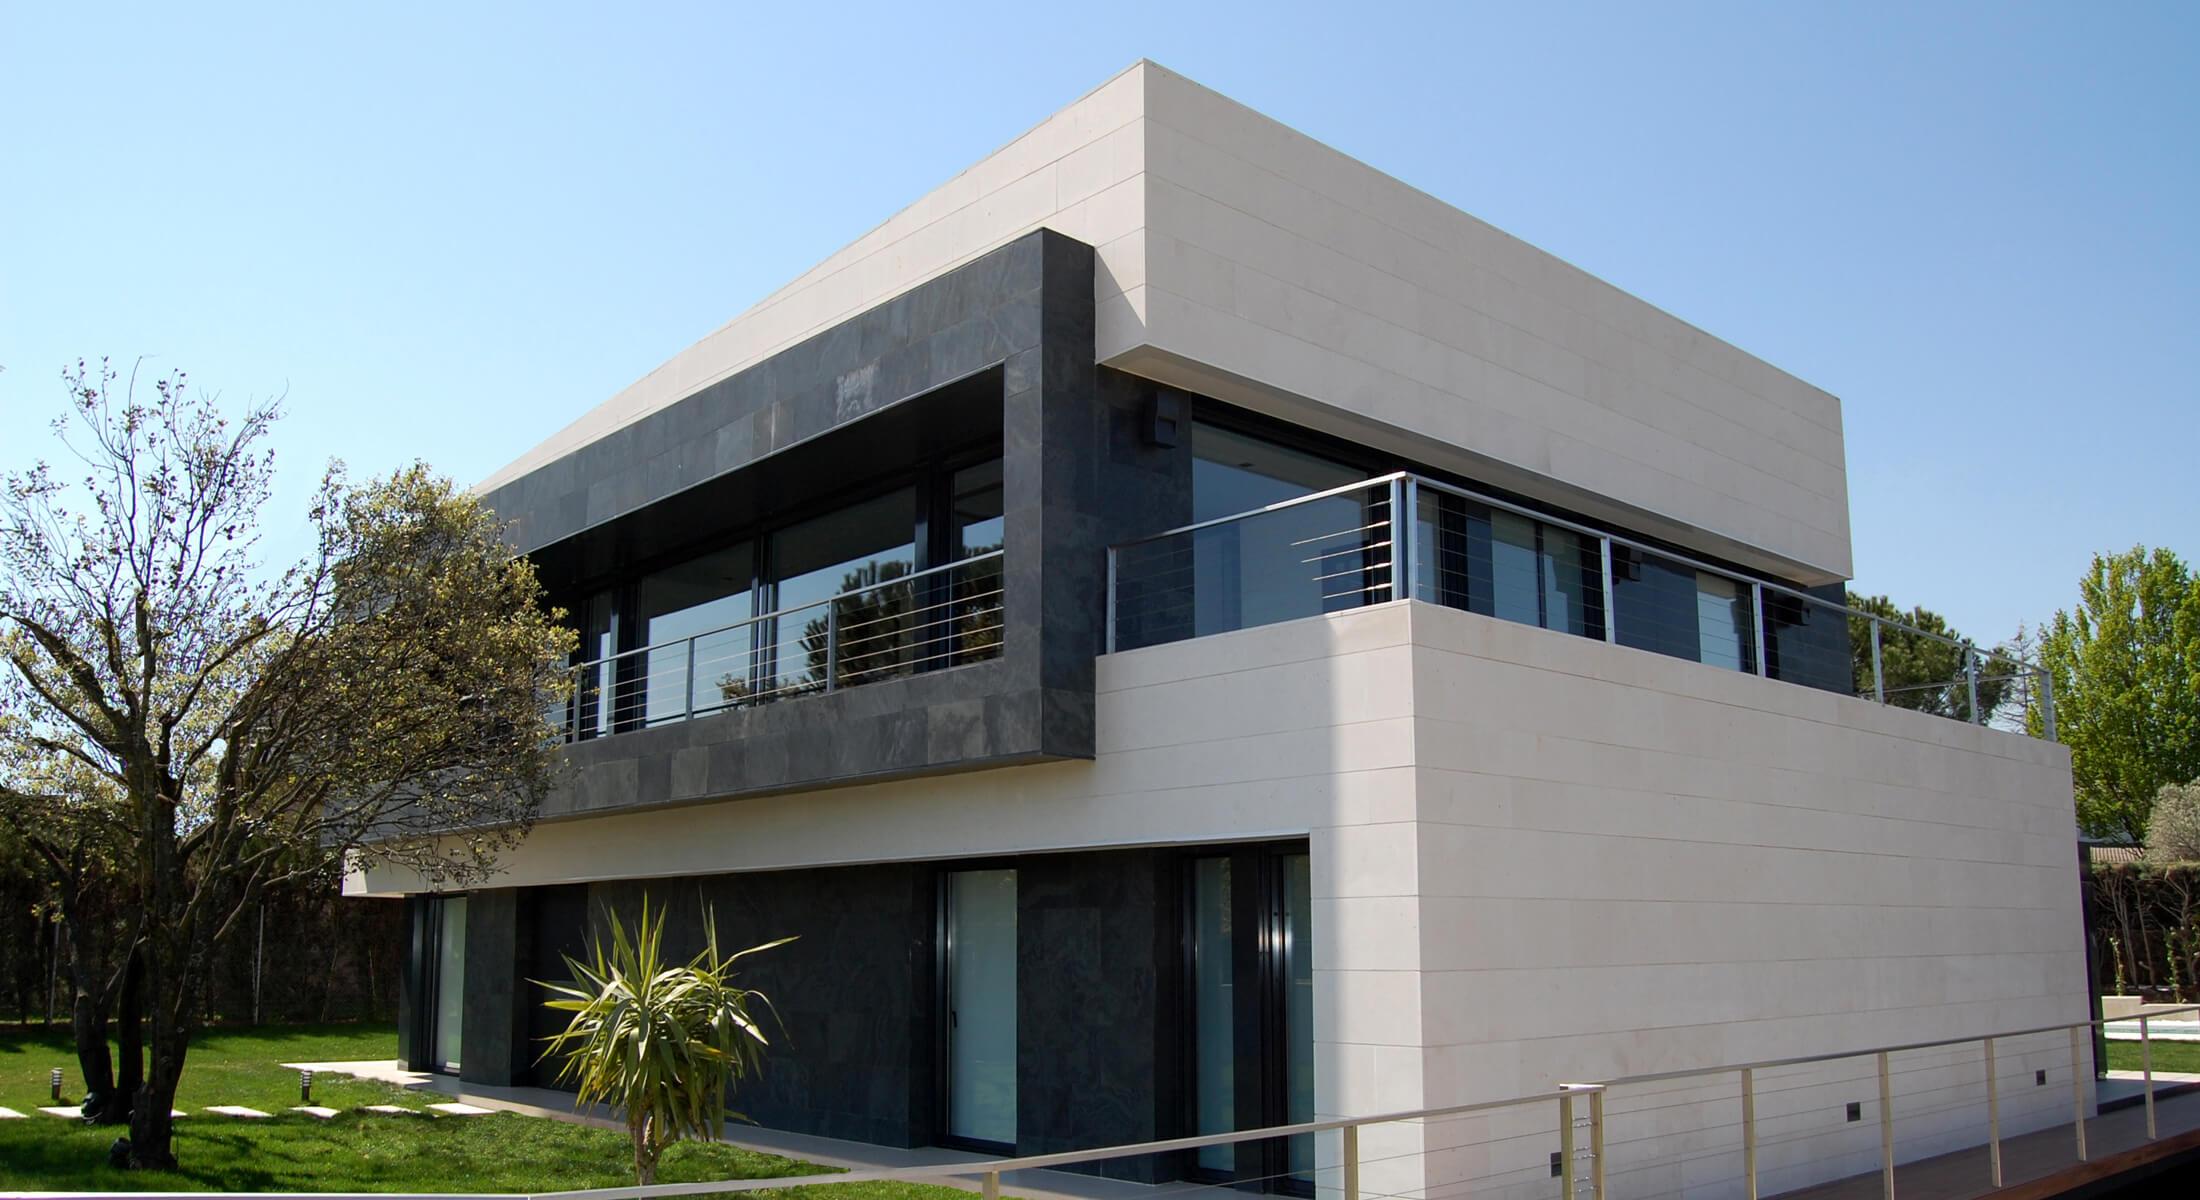 Monteclaro house designed by Marta González Architects